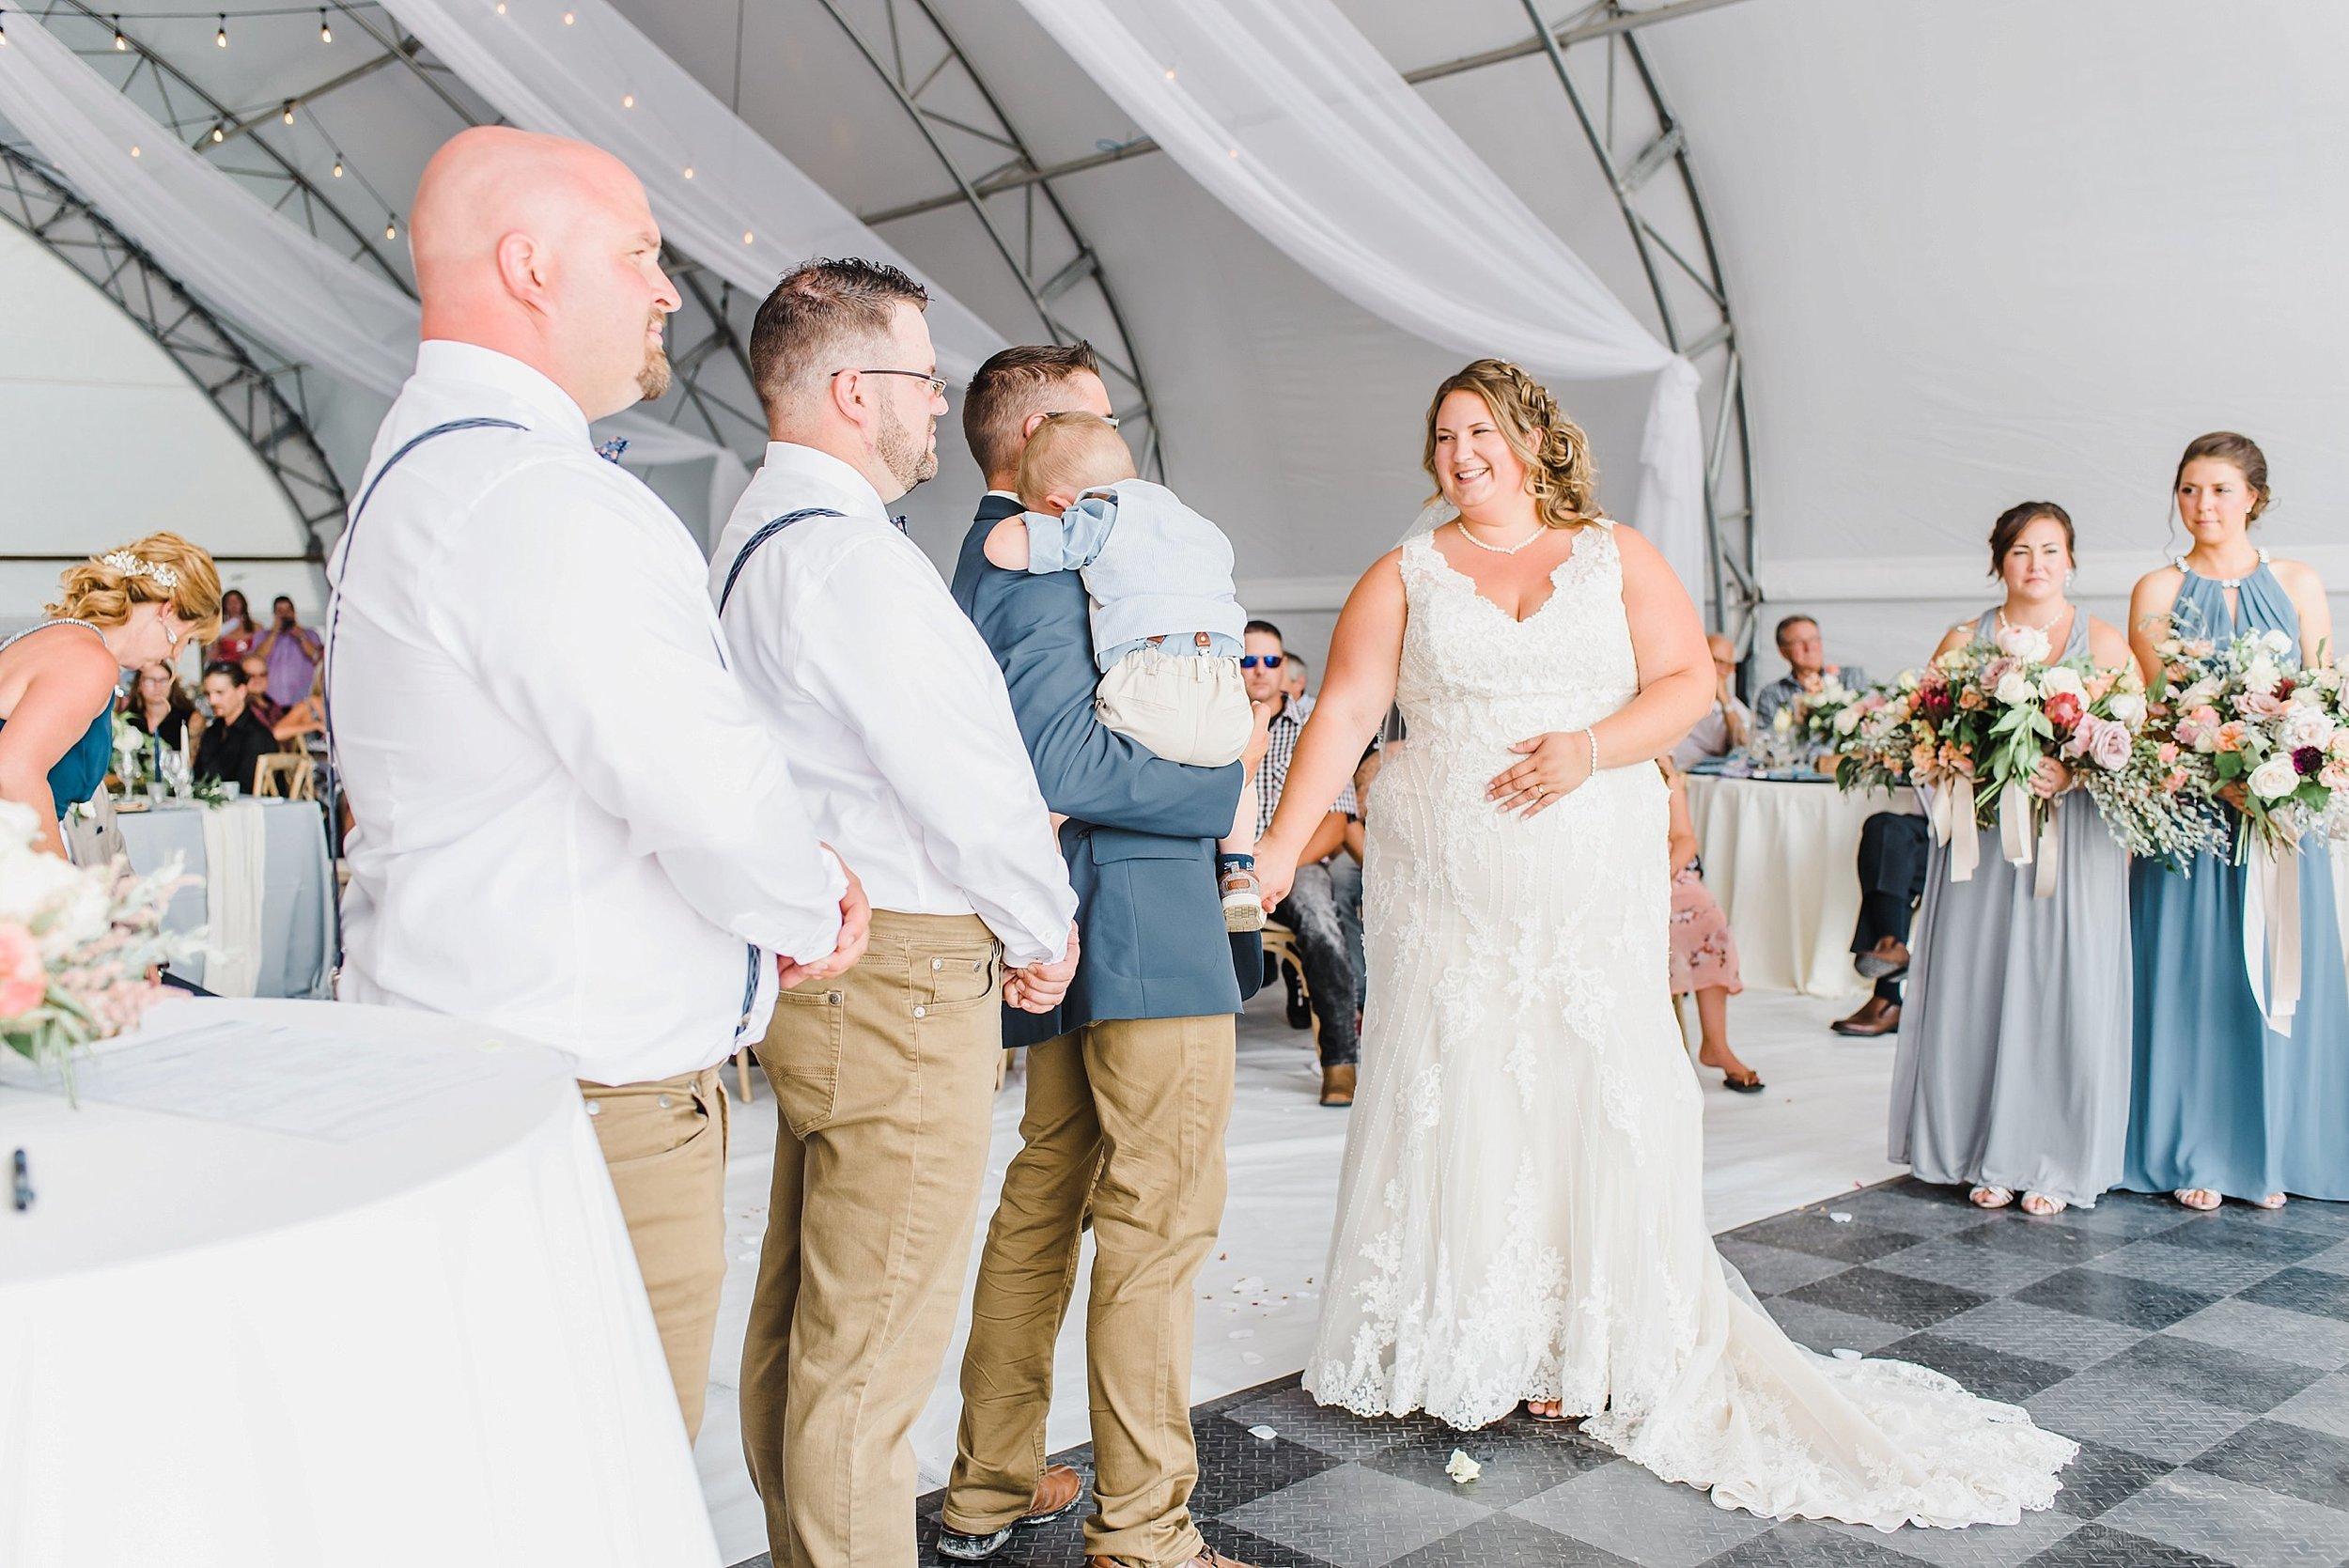 light airy indie fine art ottawa wedding photographer | Ali and Batoul Photography_0360.jpg